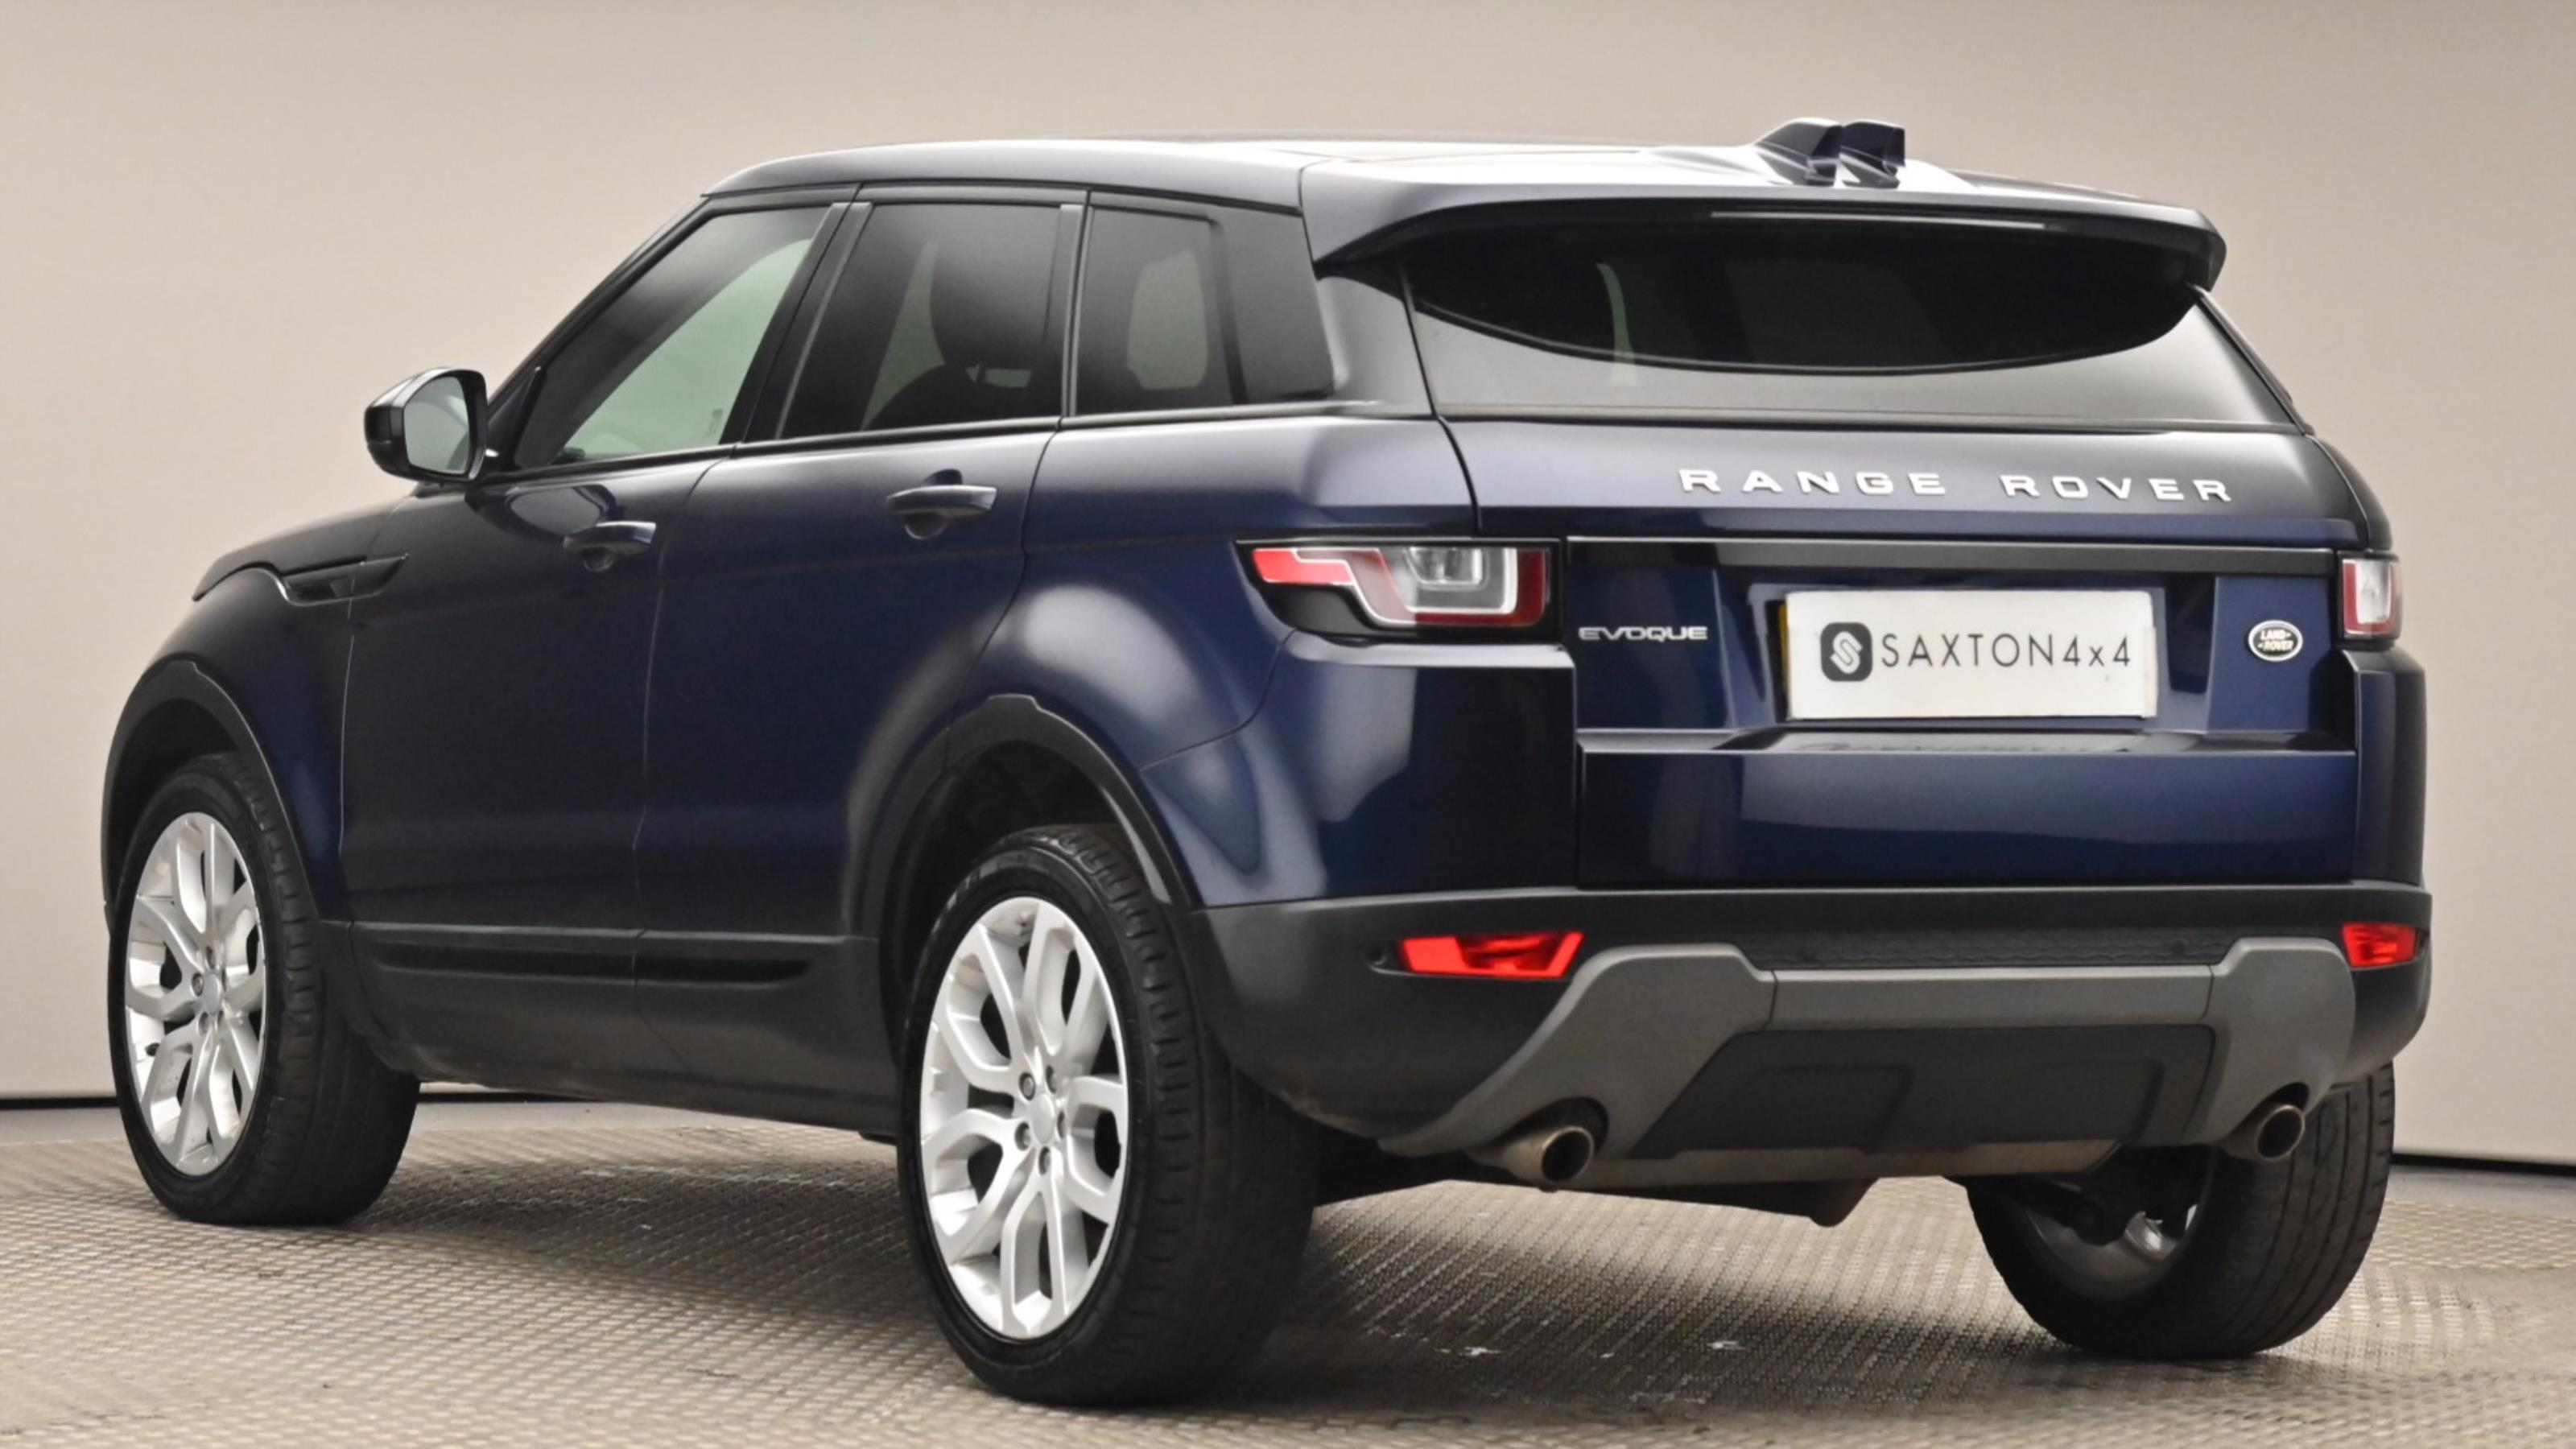 Used 2016 Land Rover RANGE ROVER EVOQUE 2.0 TD4 SE Tech 5dr Auto BLUE at Saxton4x4